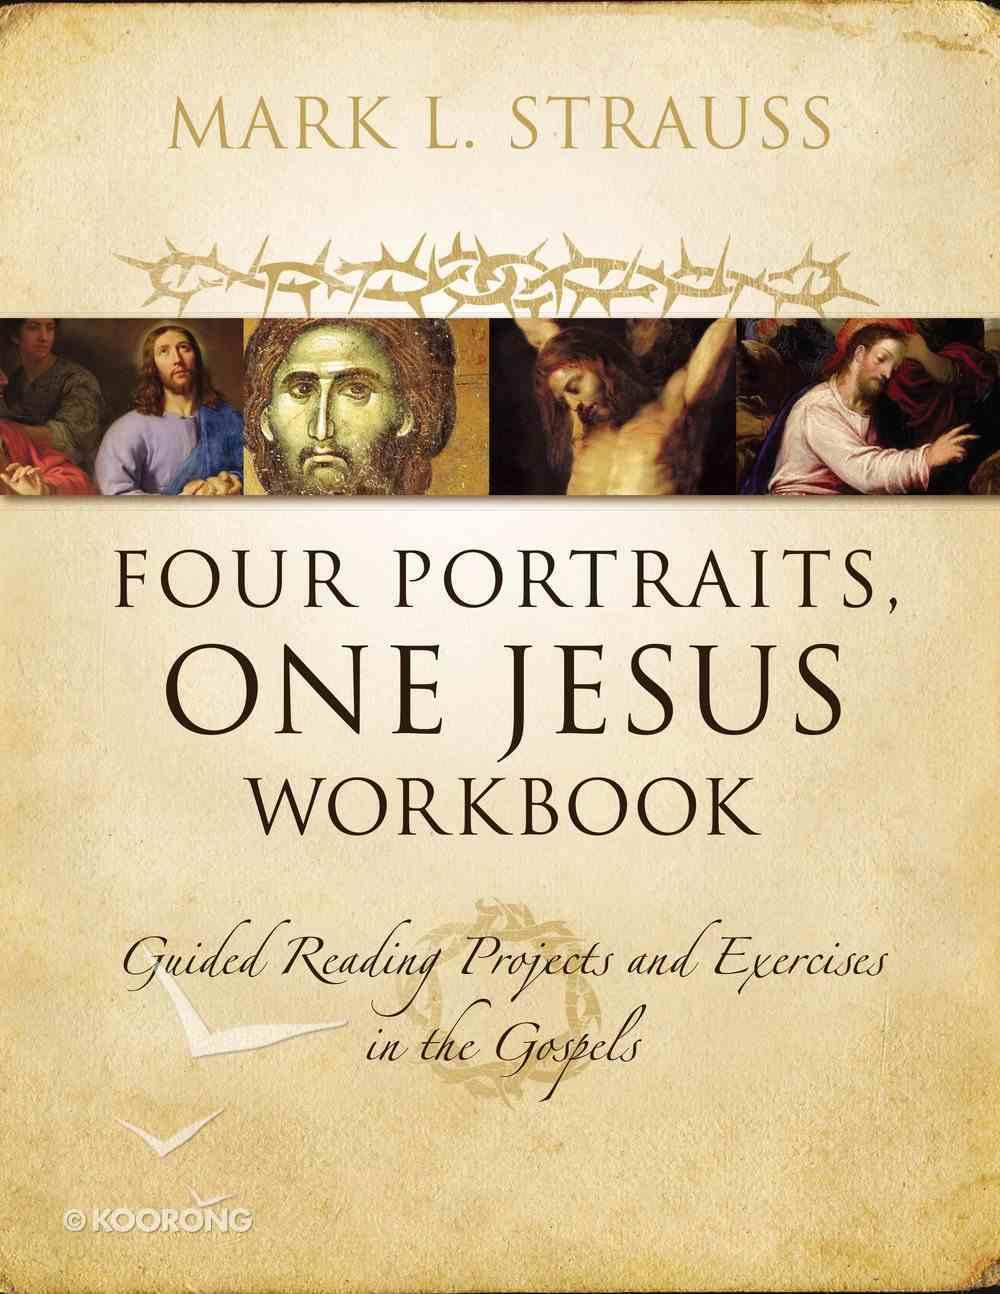 Four Portraits, One Jesus (Workbook) Paperback